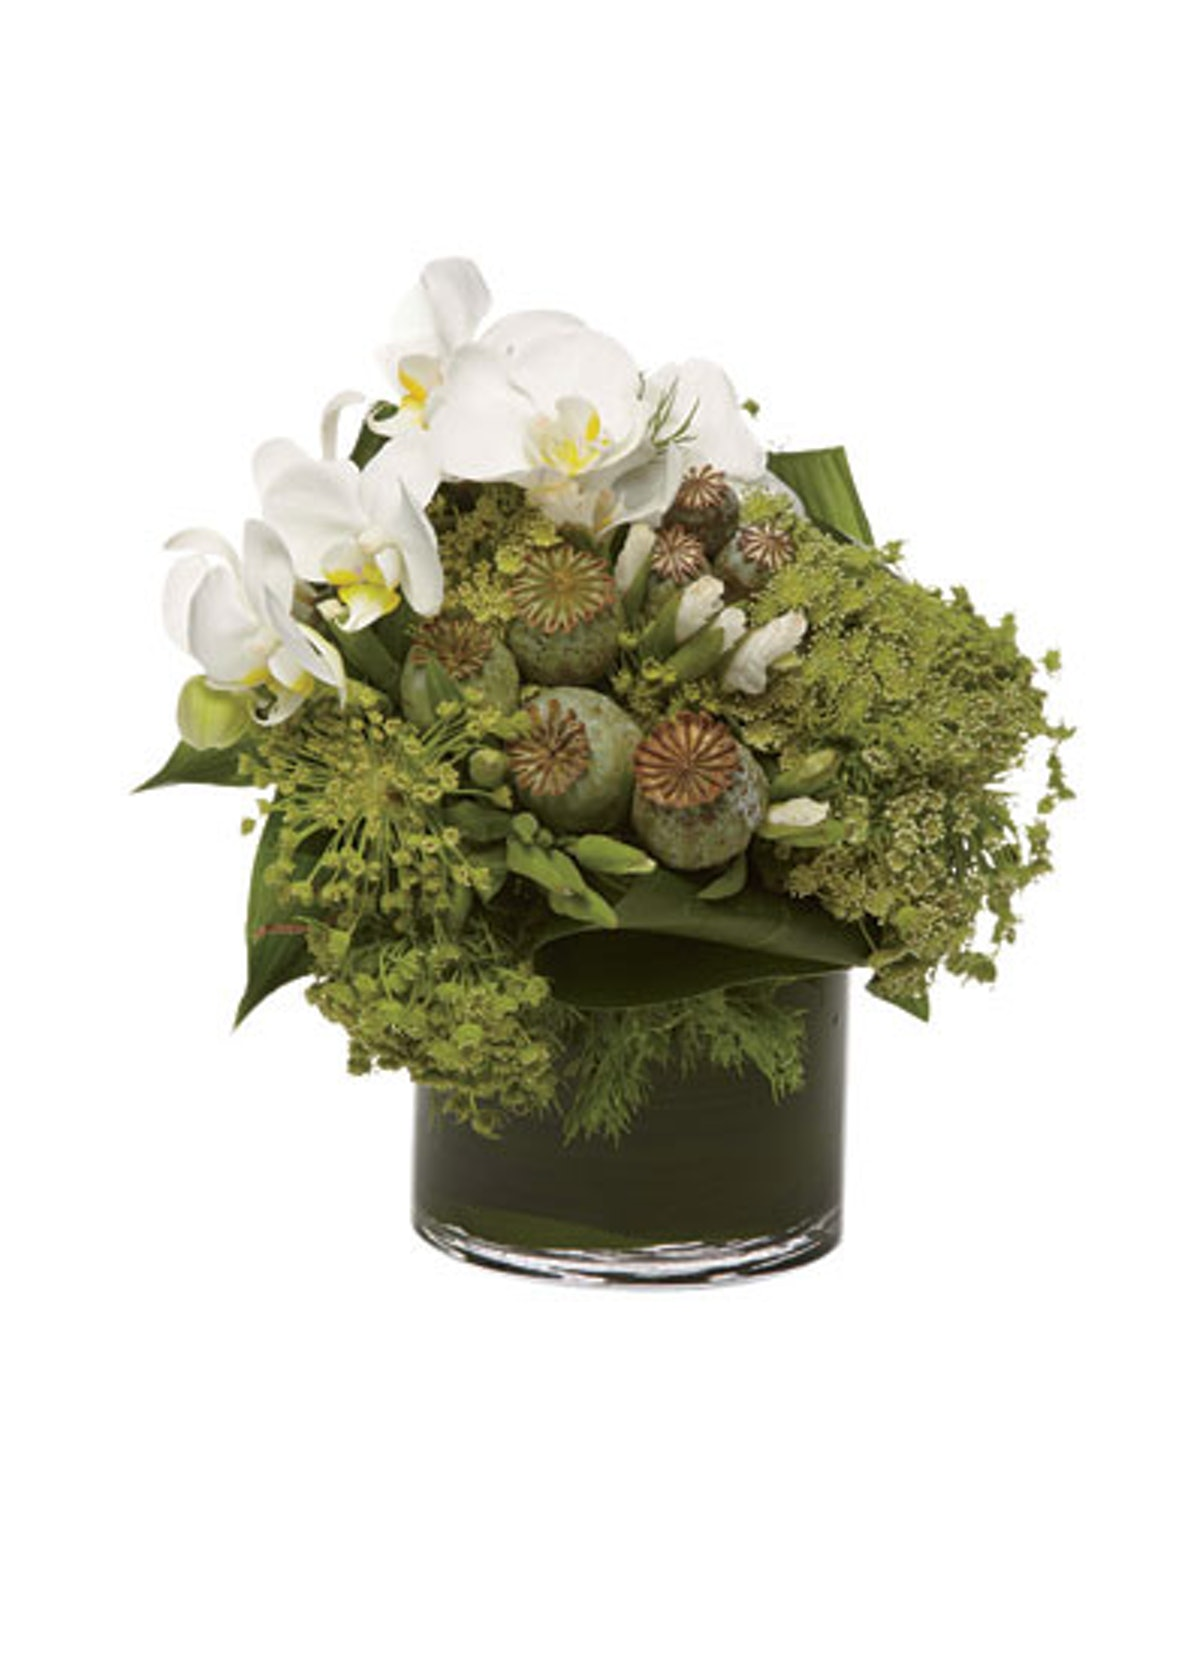 fass-gift-guide-florals-06-v.jpg